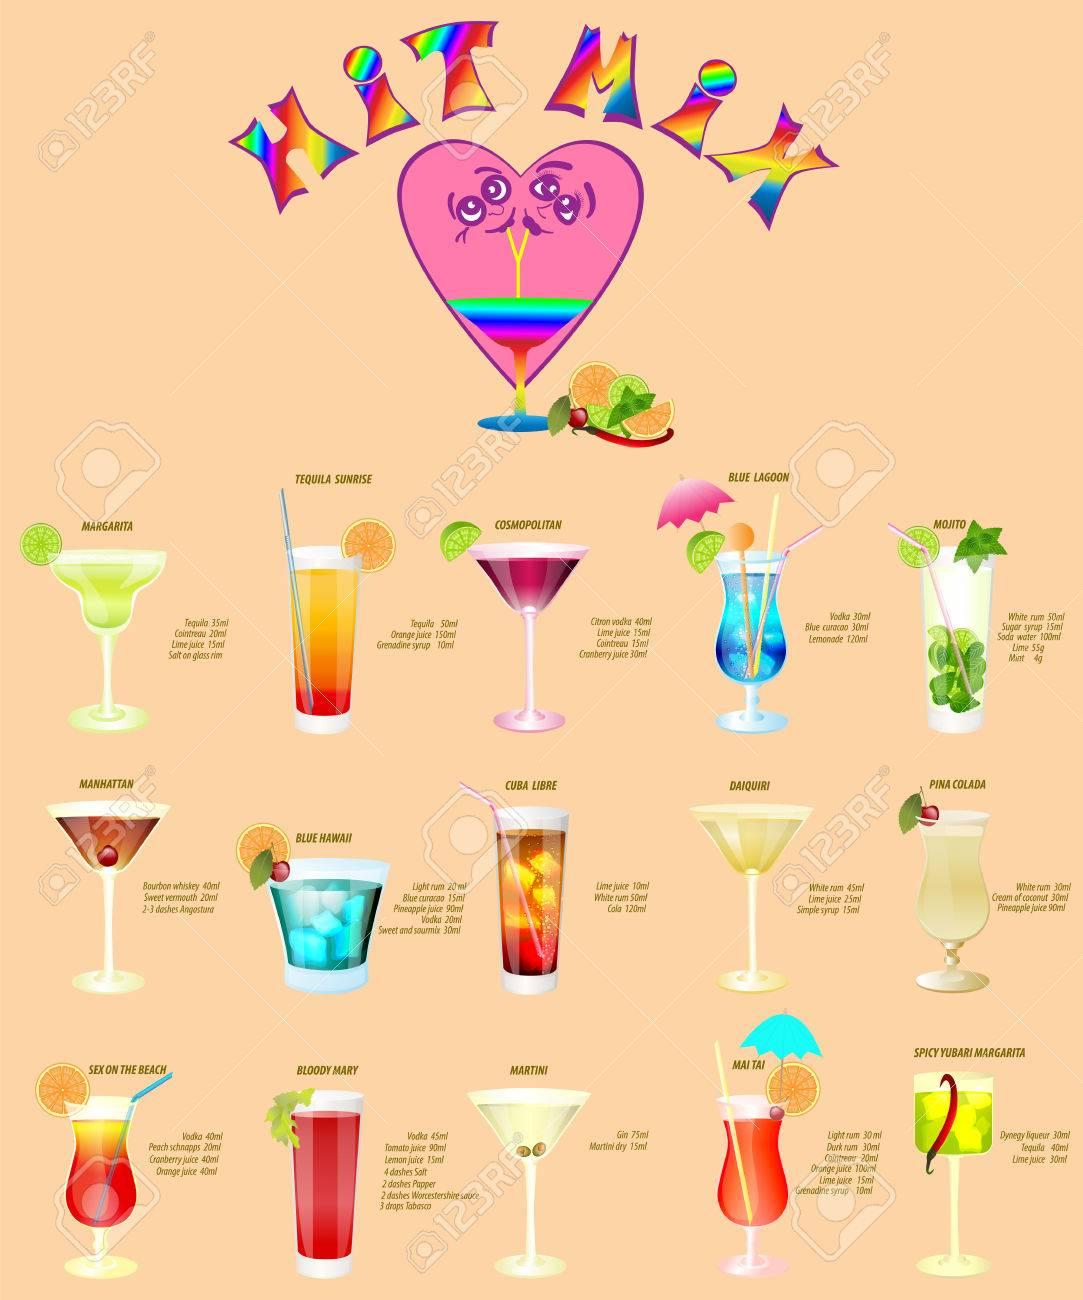 Cocktail Karte.Cocktail Menu Consisting Of Fifteen Popular Drinks